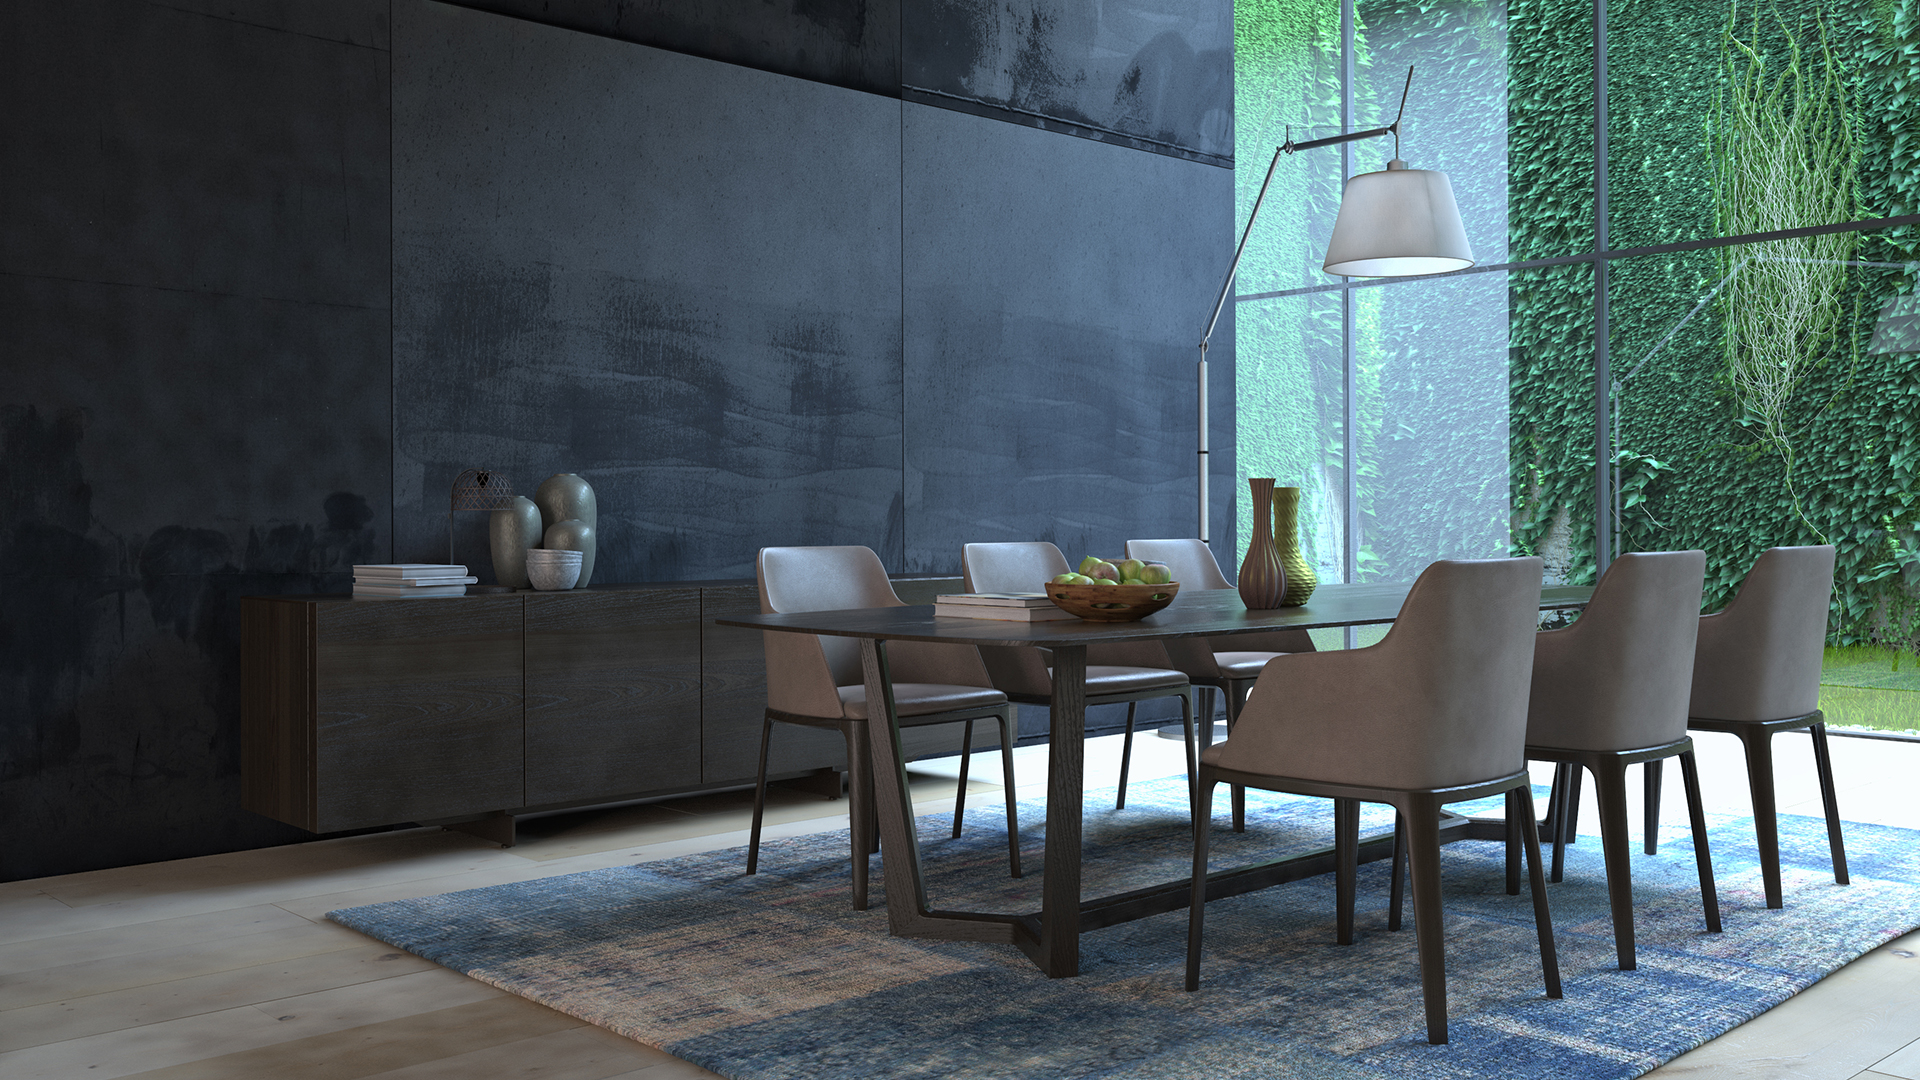 Impression Wohnraum Mariacher Real Estate